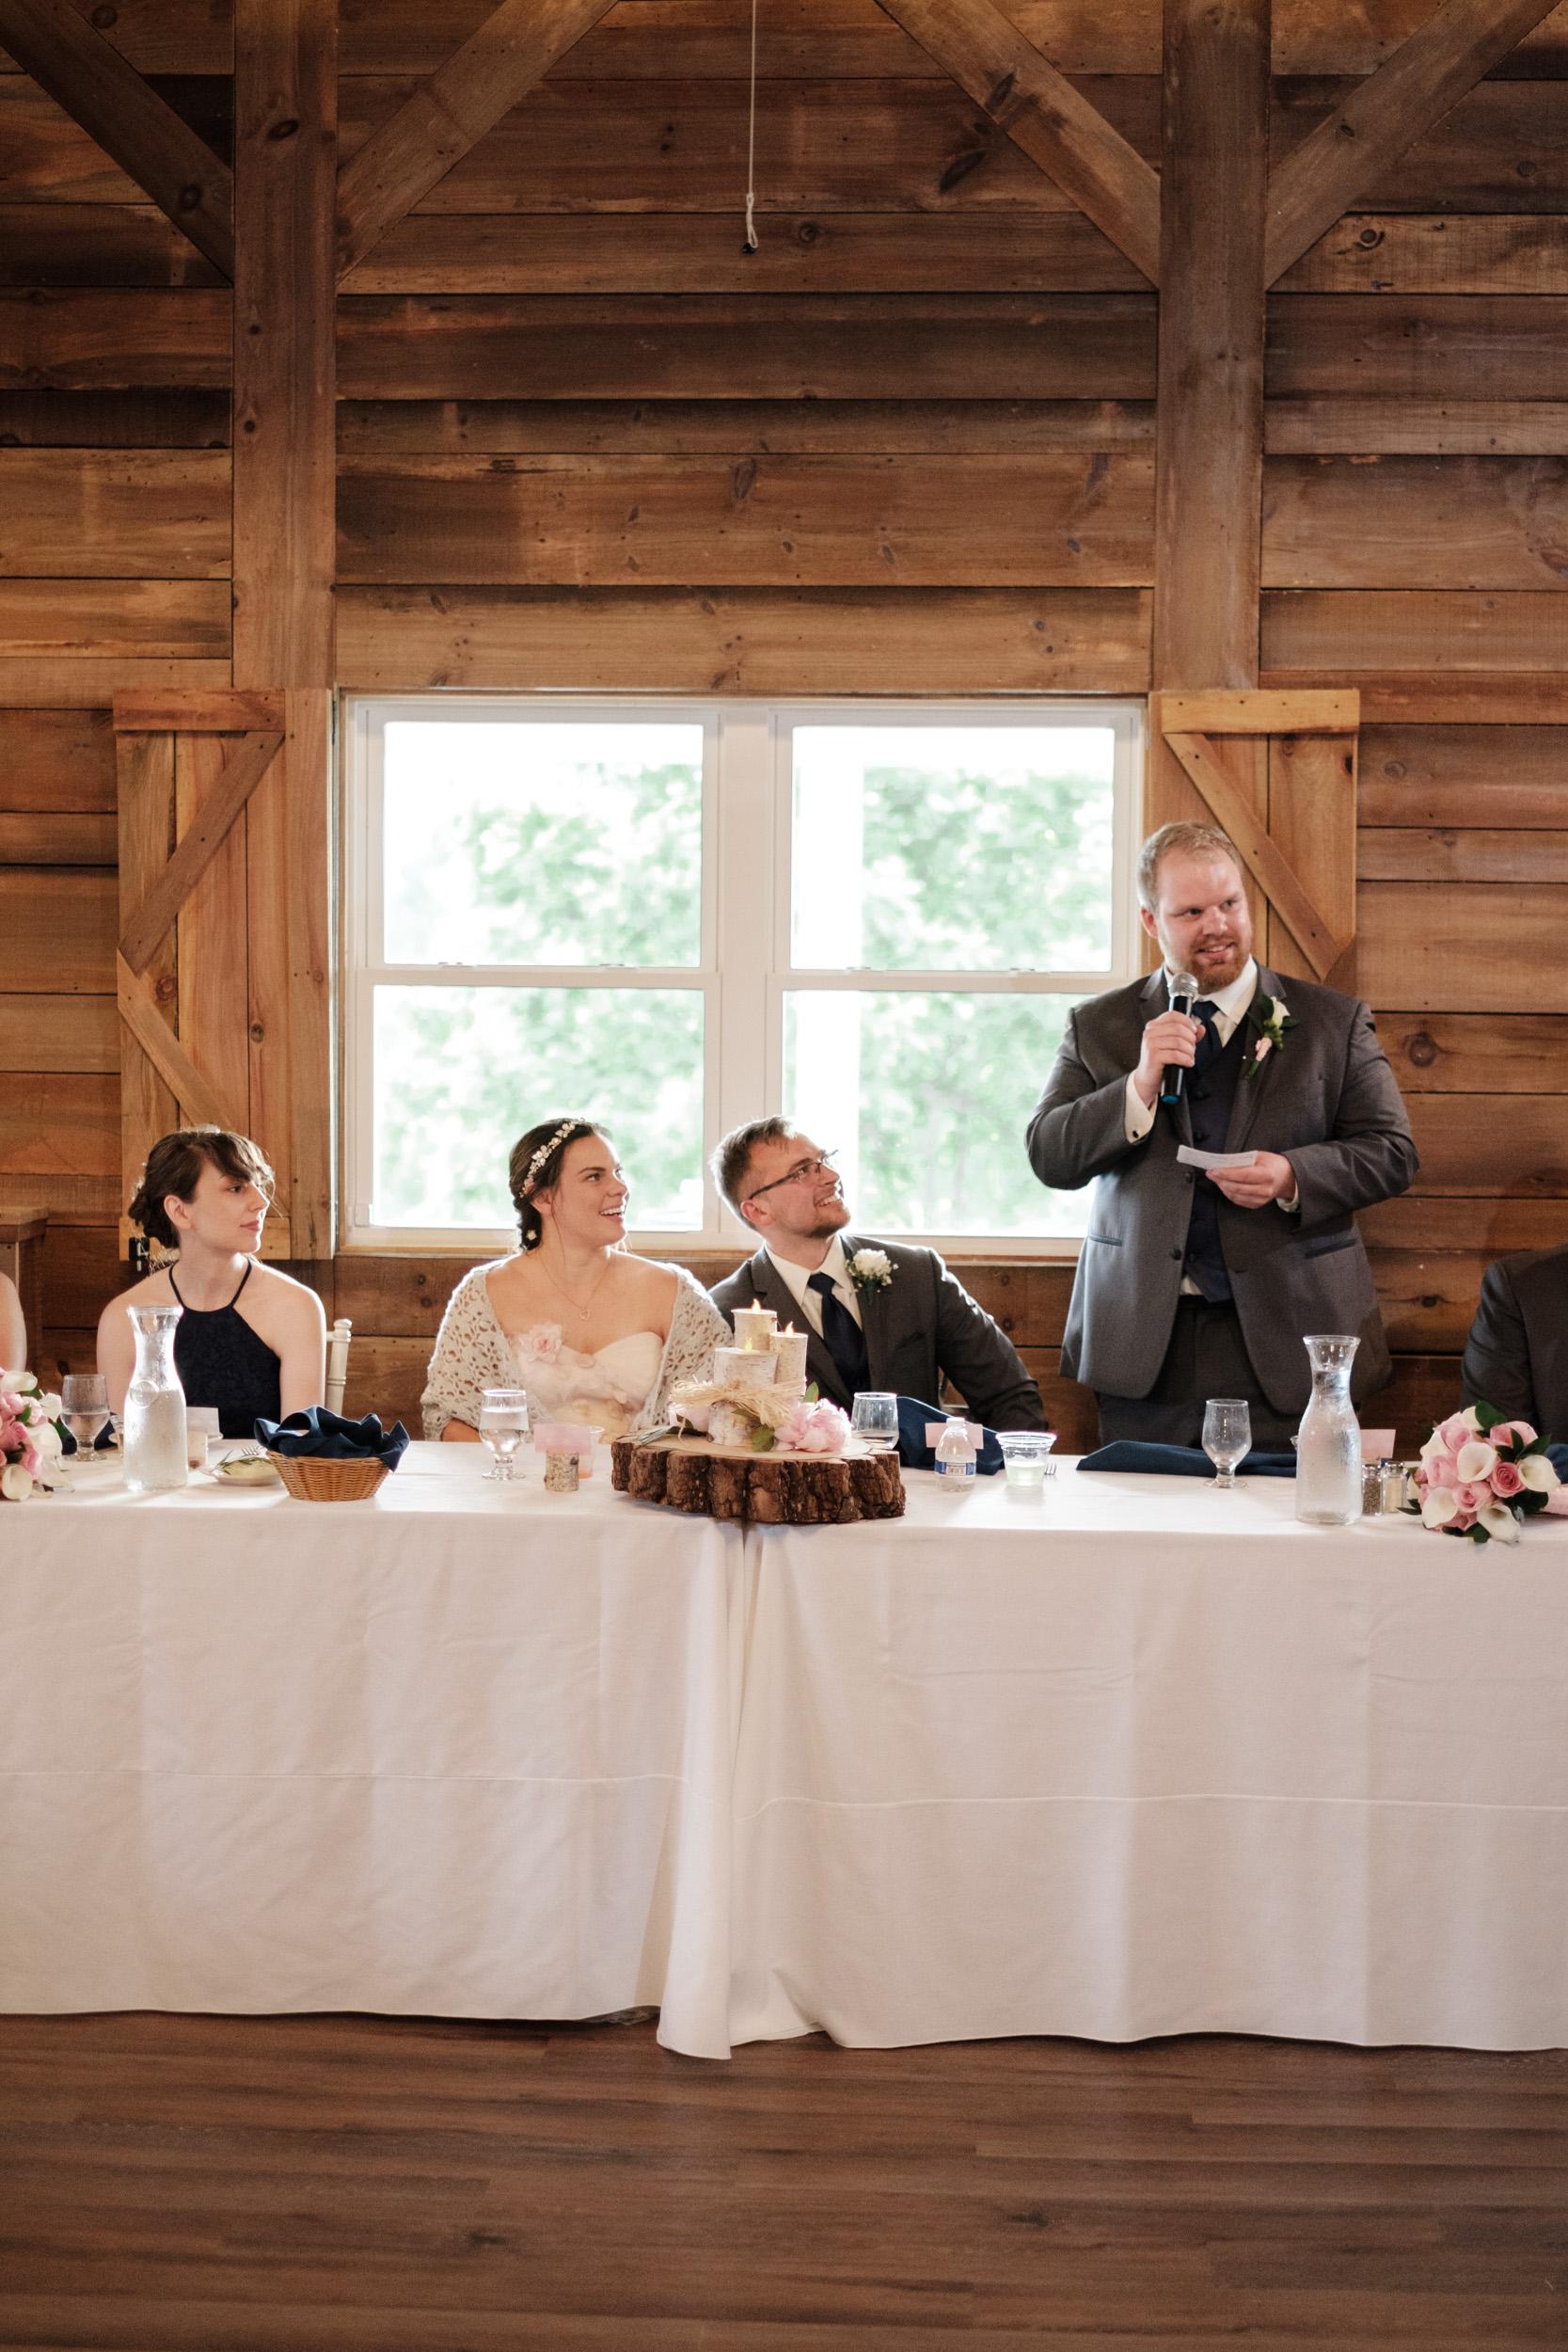 19-06-22-Ryan-Katie-The-Fields-Reserve-Wedding-56.jpg